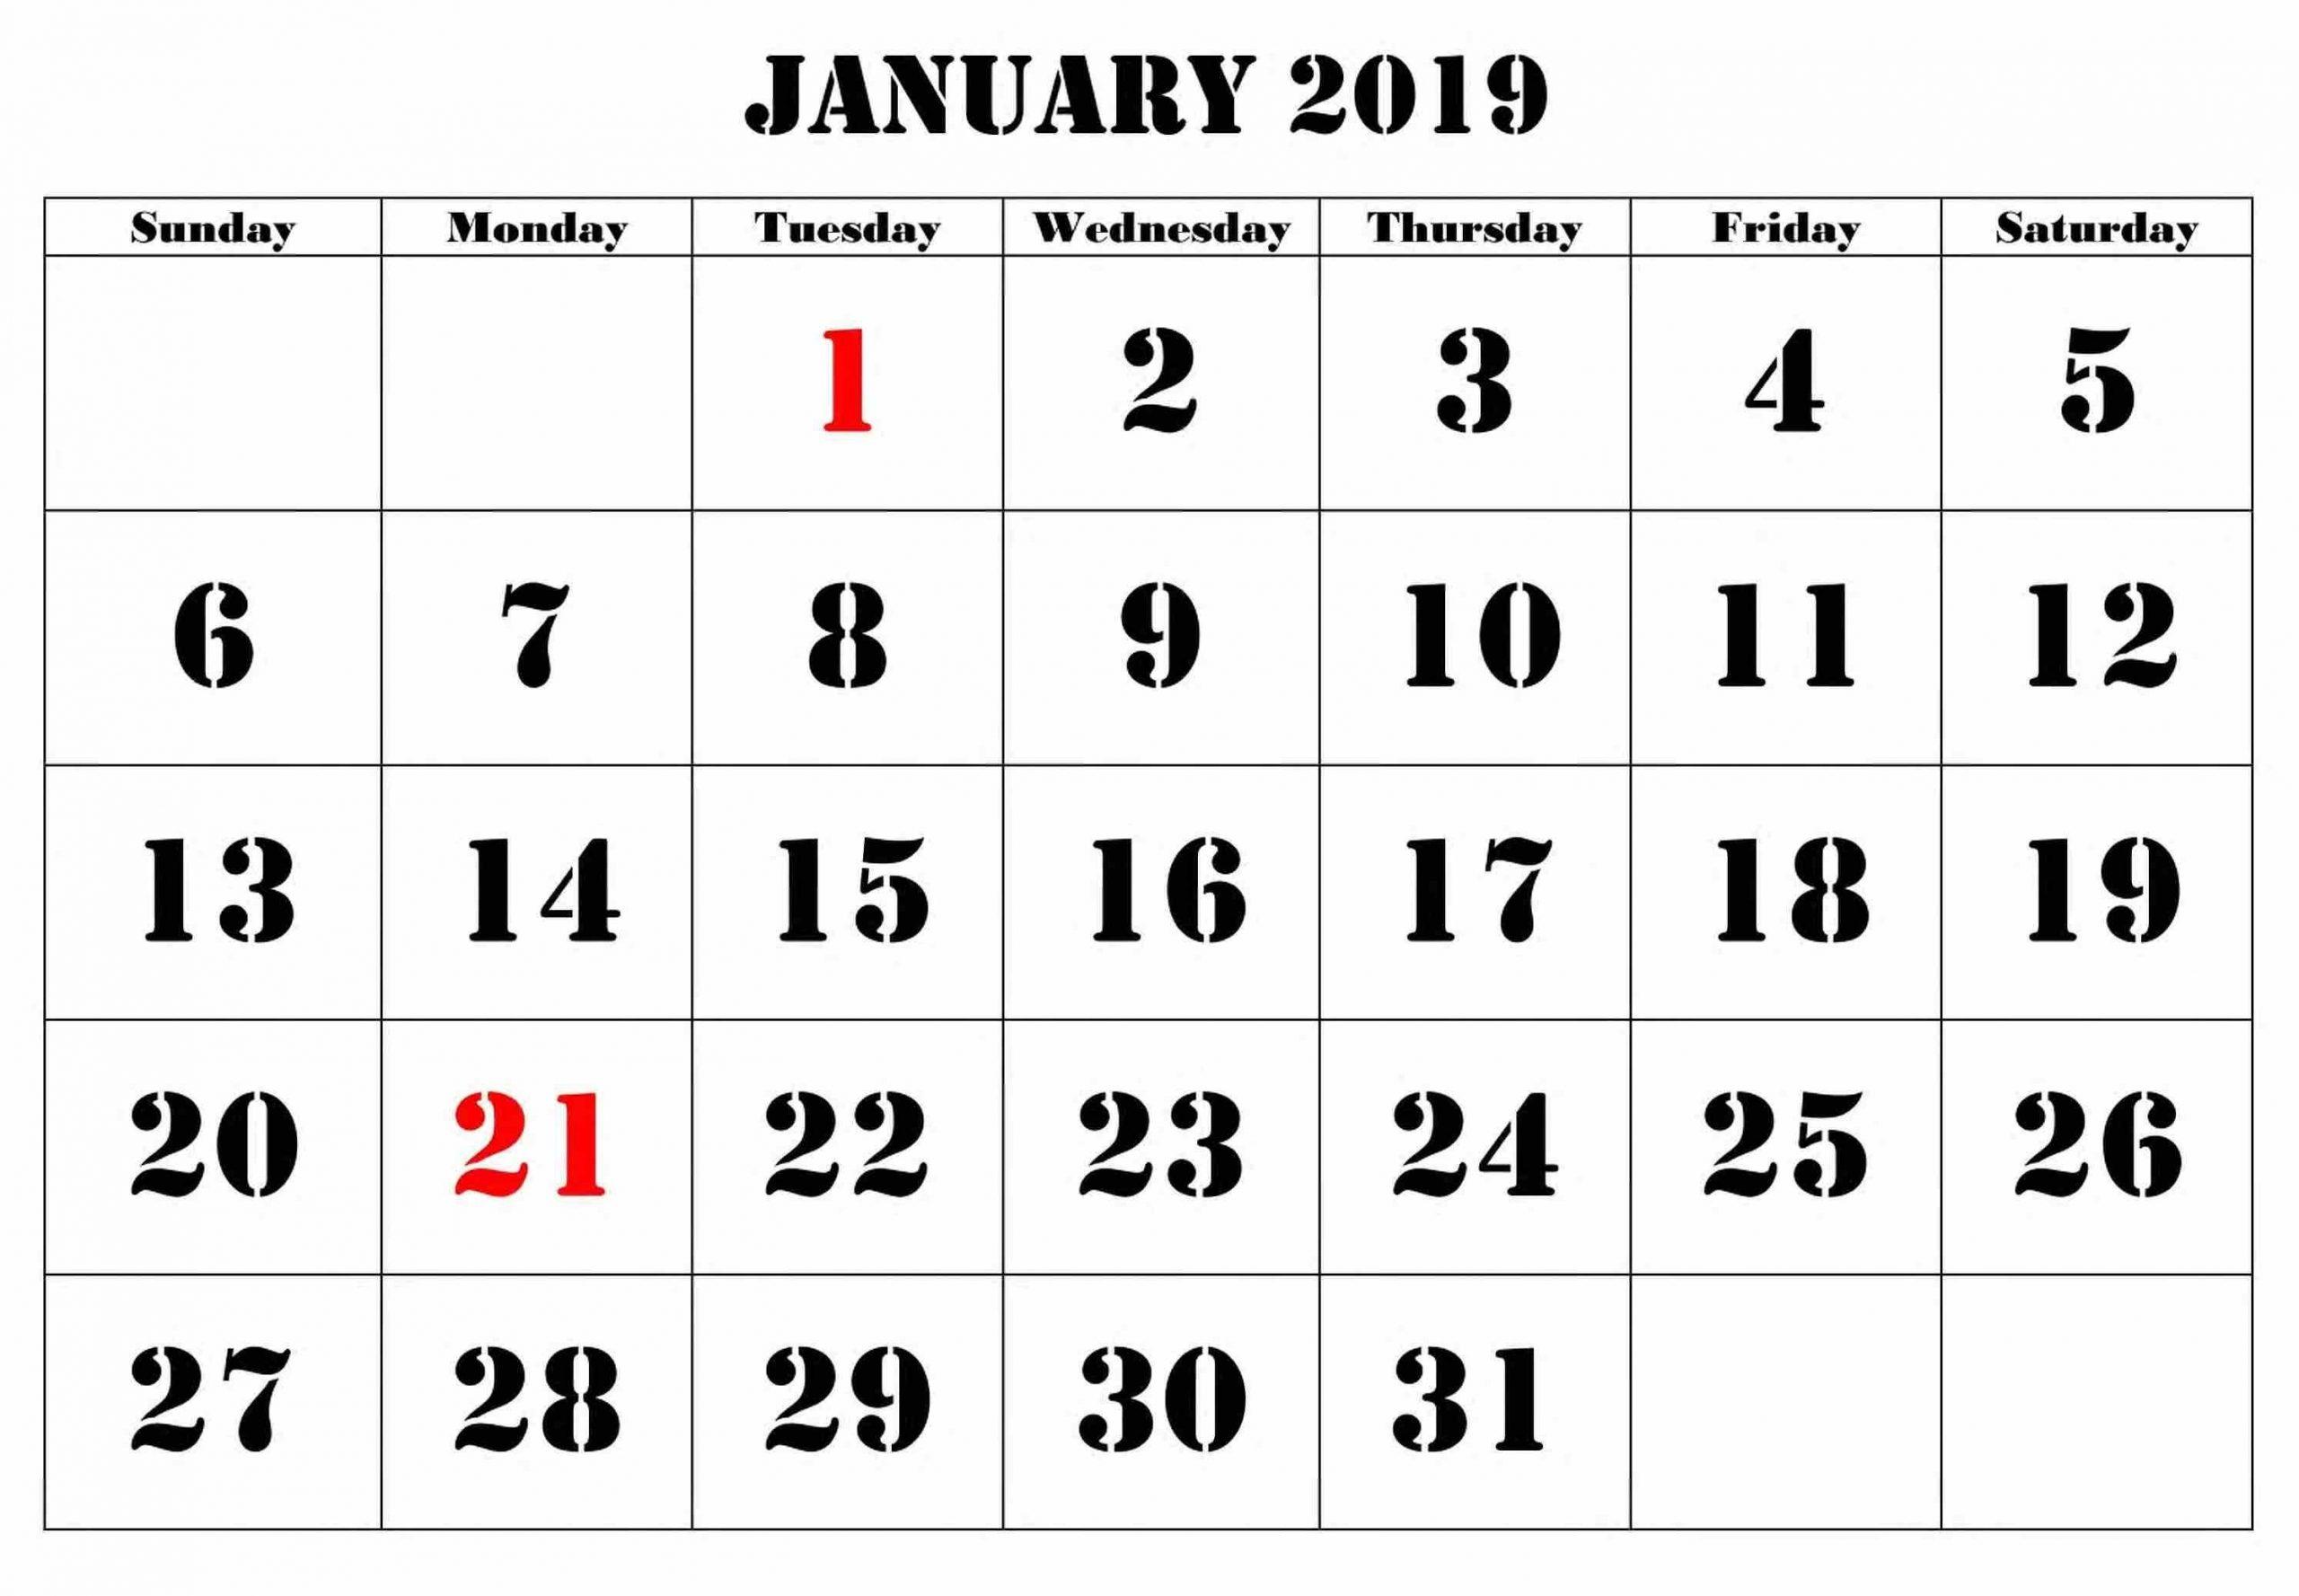 Calendar January 2019 Large Number #Januarycalendar-Printable Calendars Large Numbers